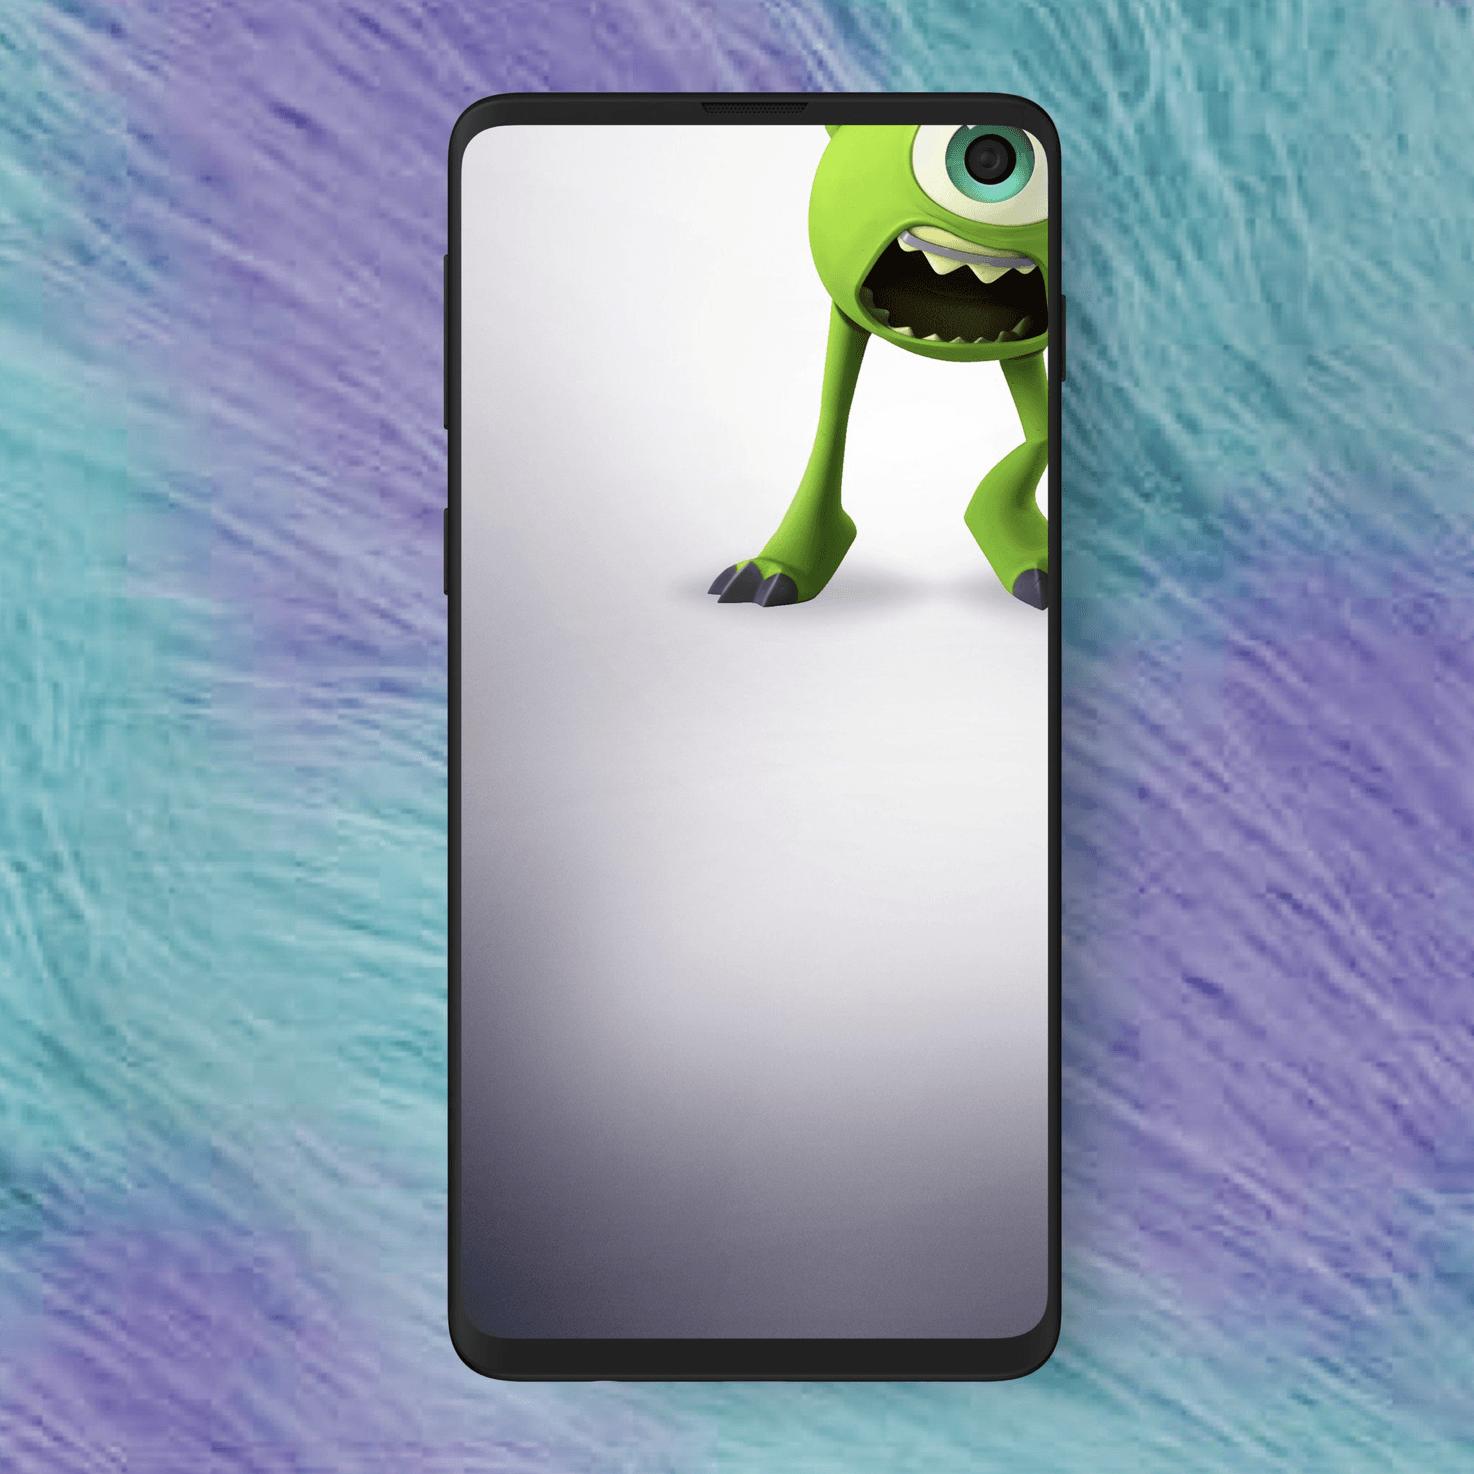 Samsung Galaxy S10e Wallpapers Wallpaper Cave